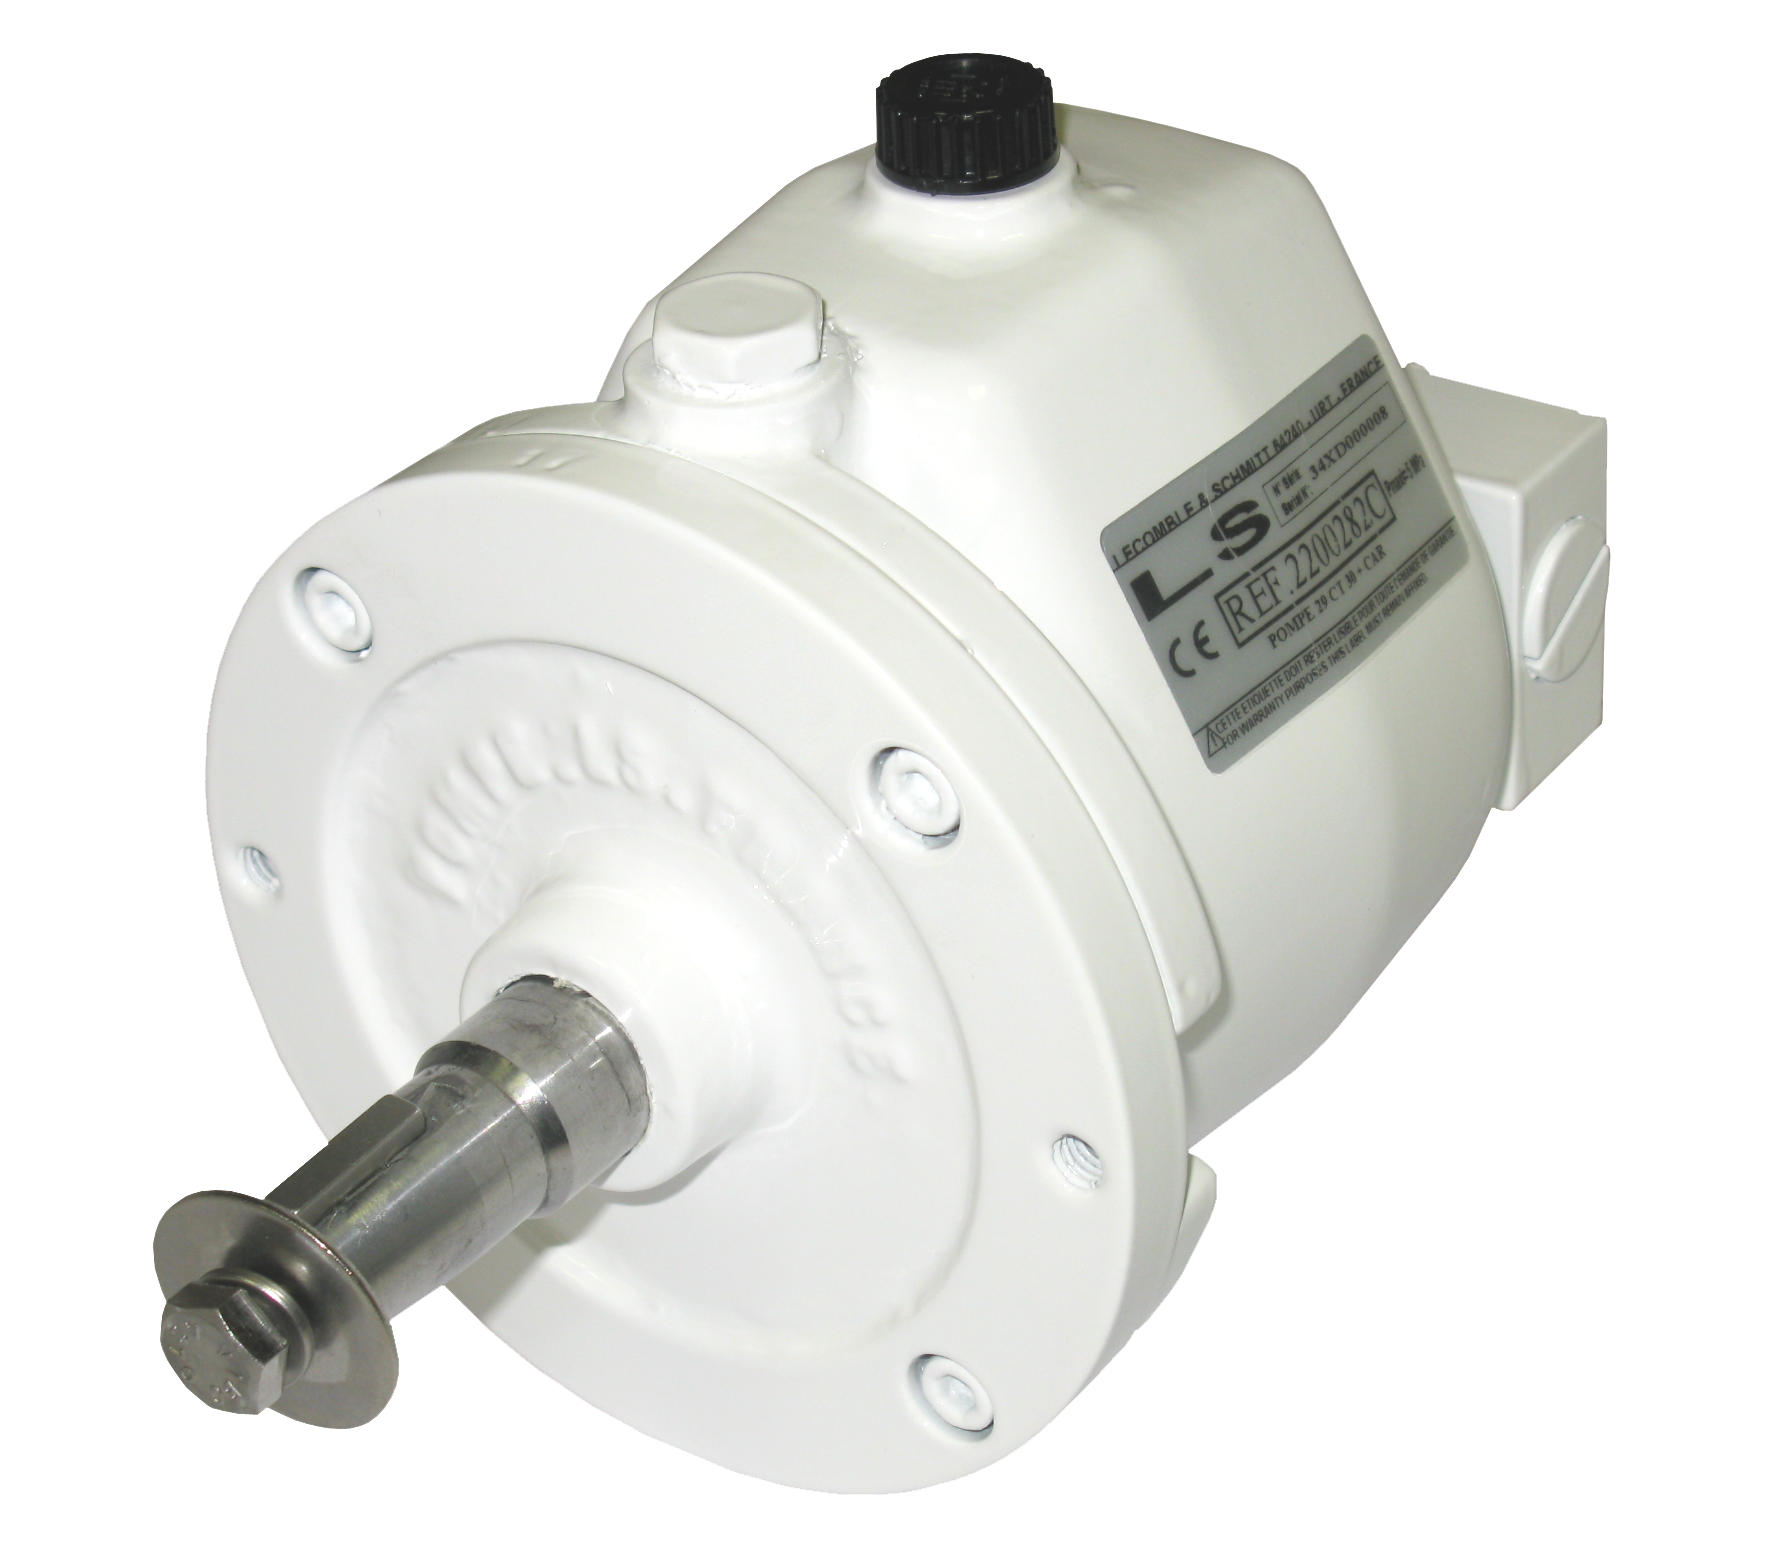 Pumps 29/40 CT 30 with lock valve